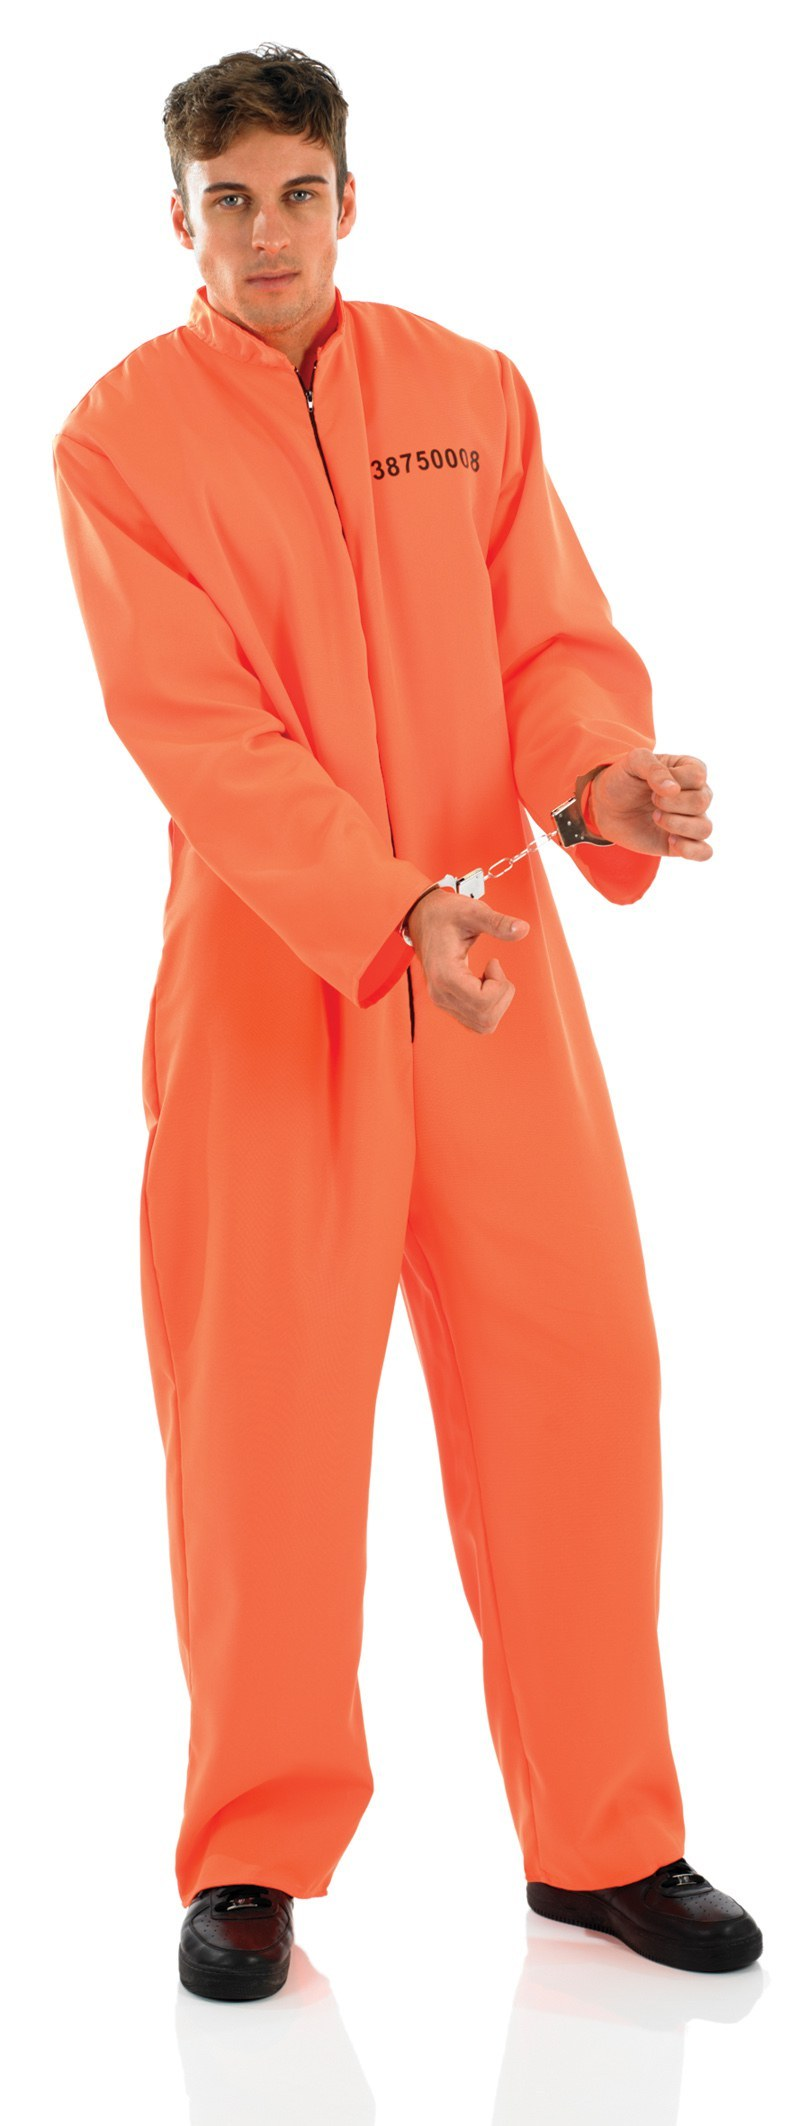 Jefferson County Inmate Details for Johnson, Jonas